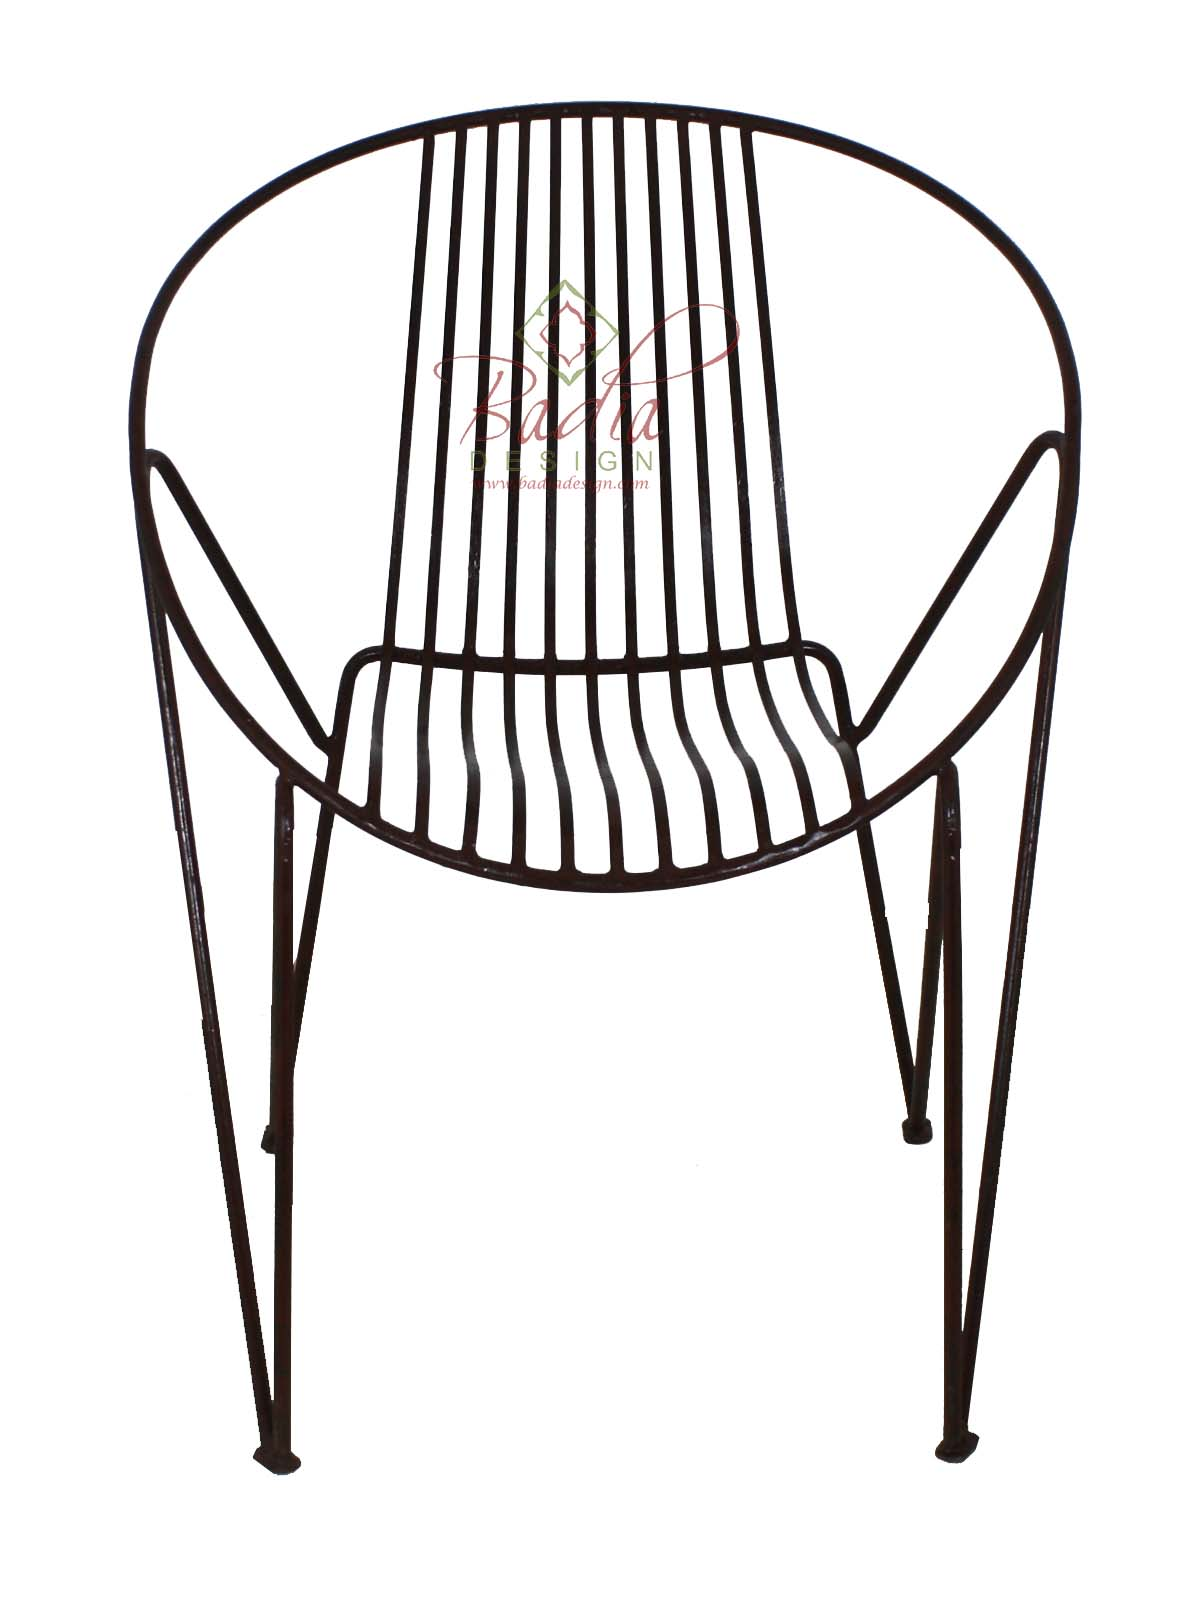 moroccan-handmade-wrought-iron-chair-ic027-1.jpg